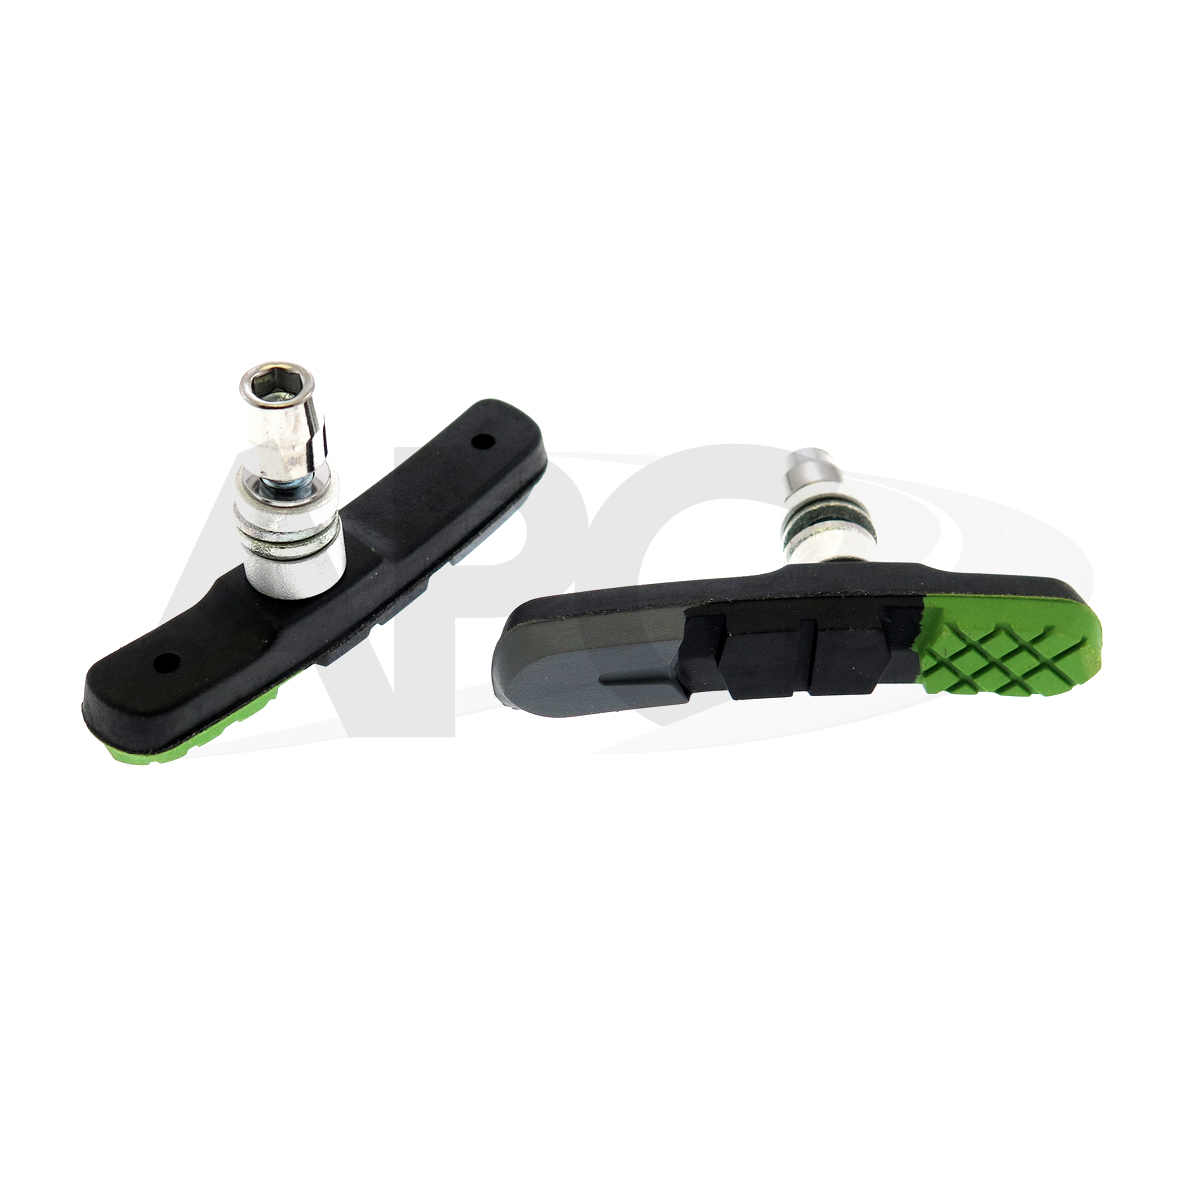 KLOCKI HAMULCOWE mtb-960 V kolor: szaro-czarny-zielony